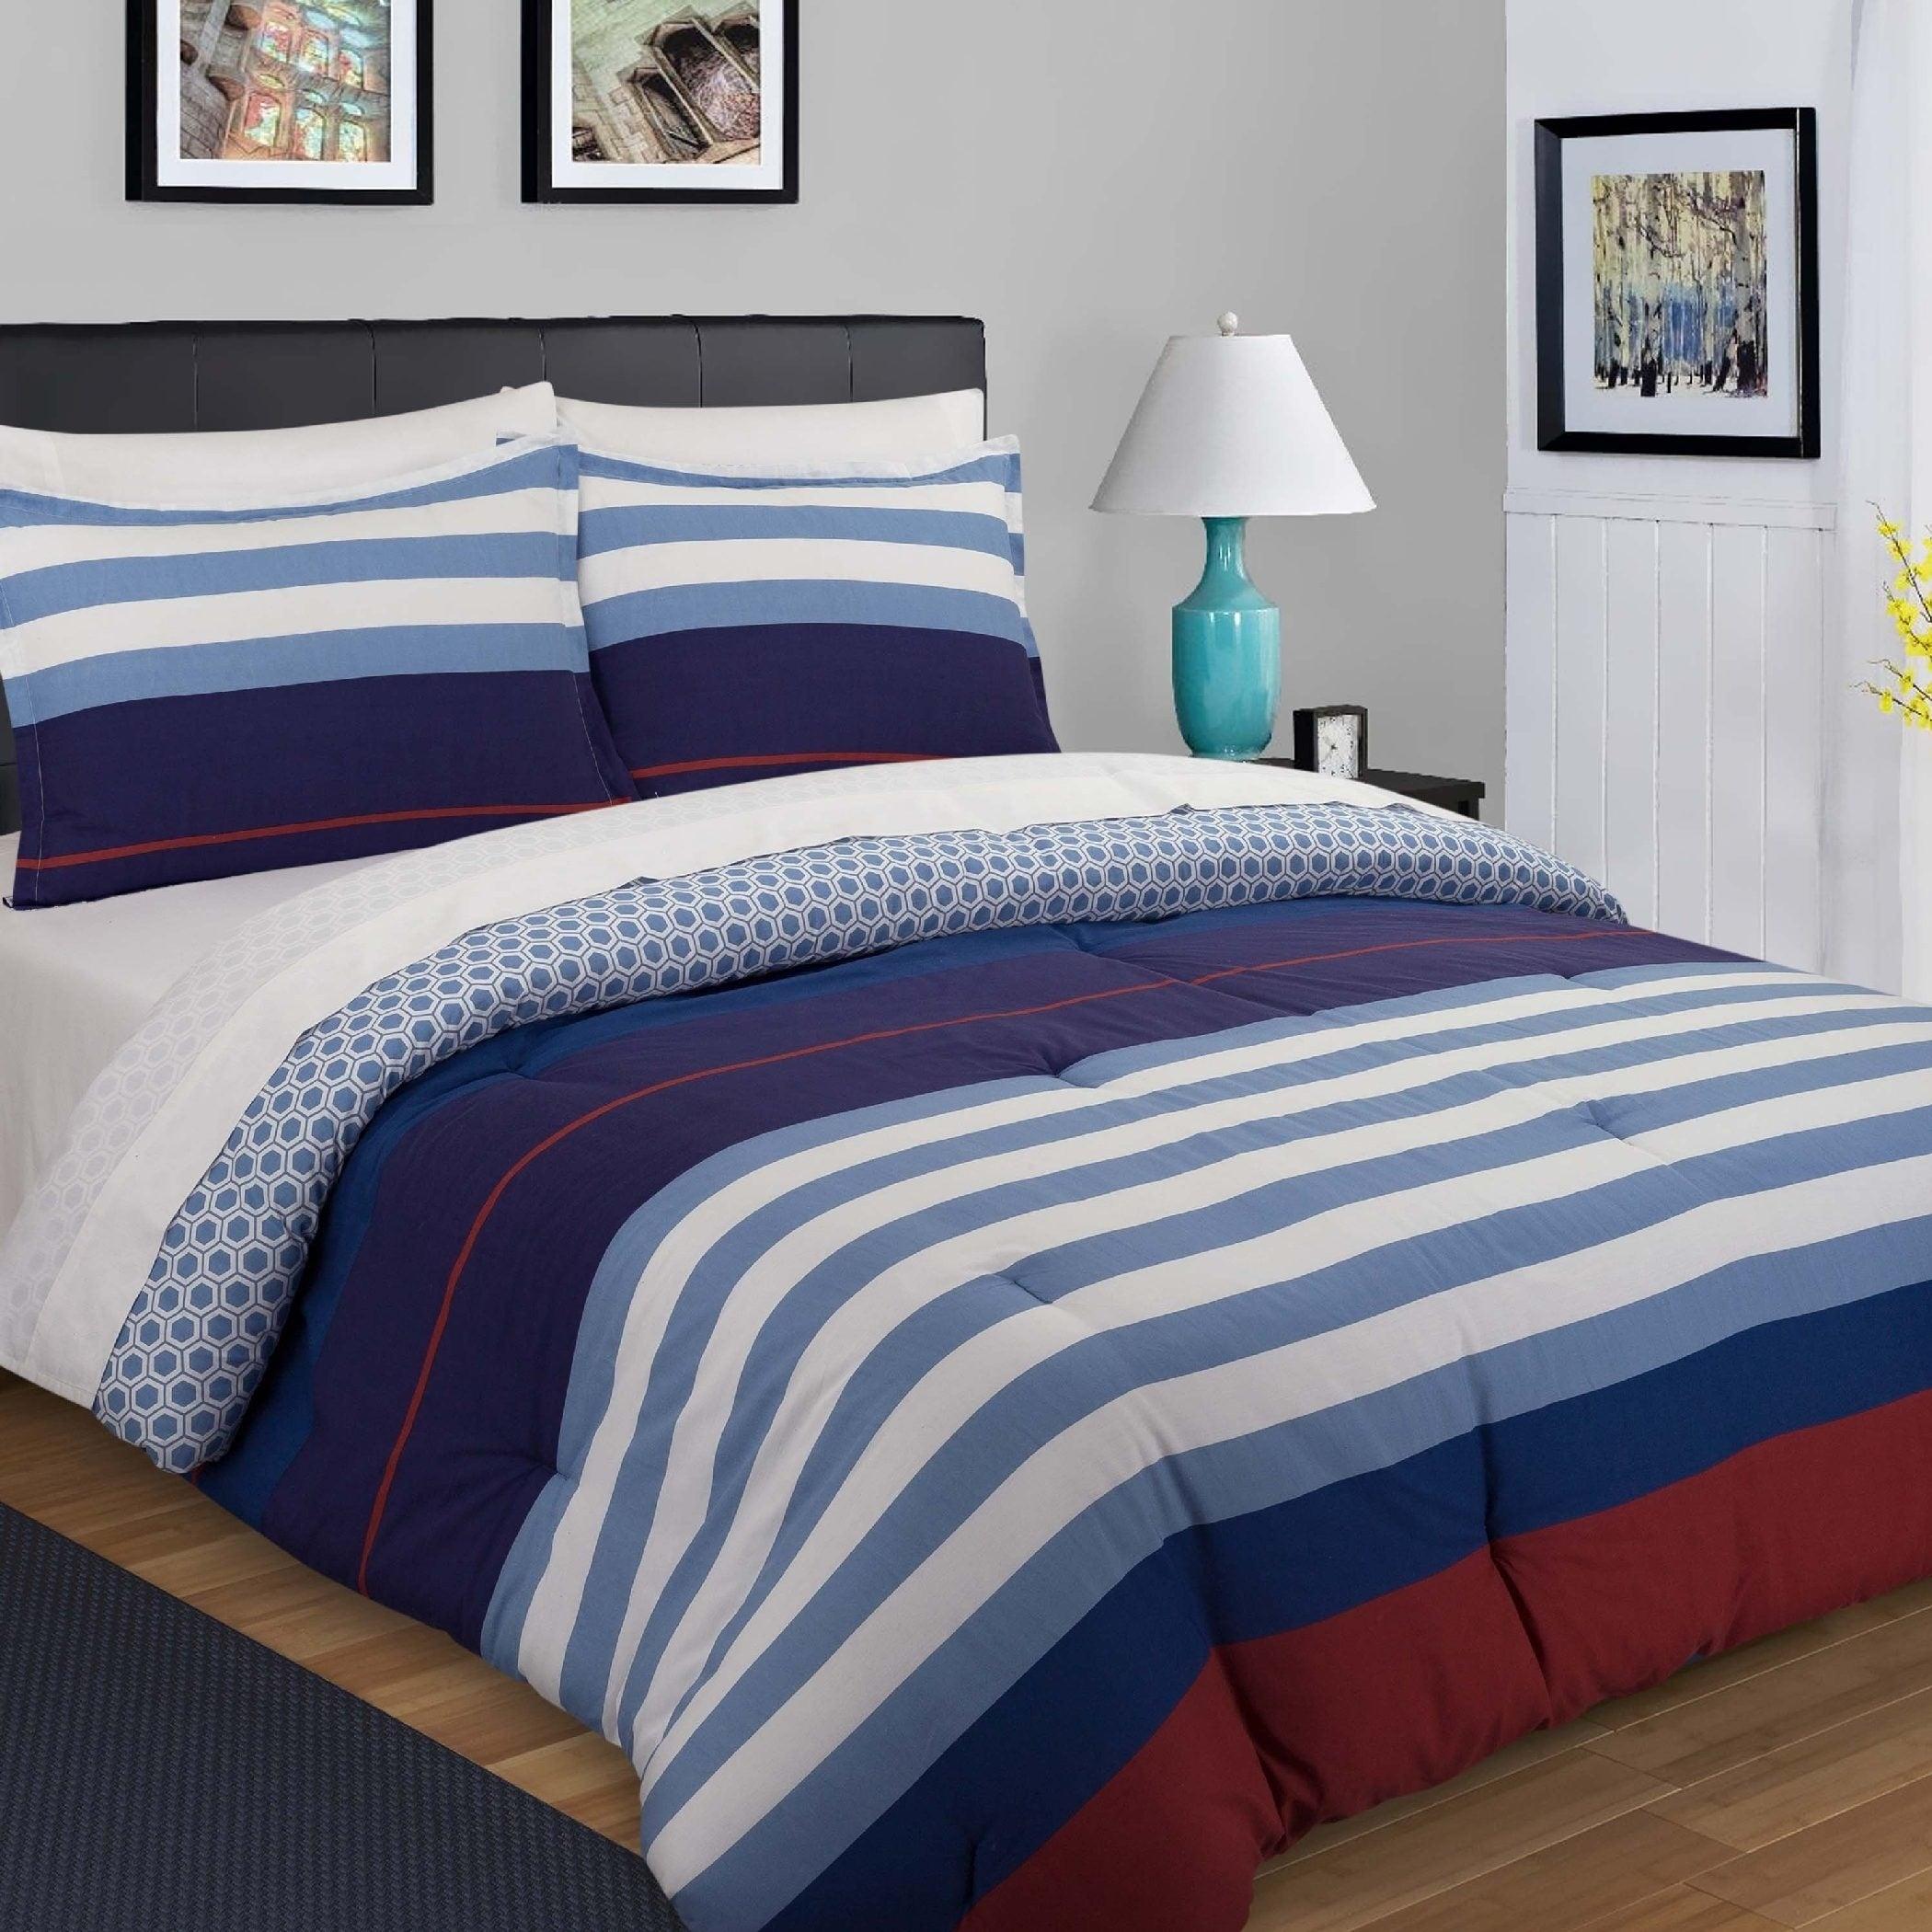 decoration bedspreads sets set jcpenney comforter penneys nautical bedding queen jc